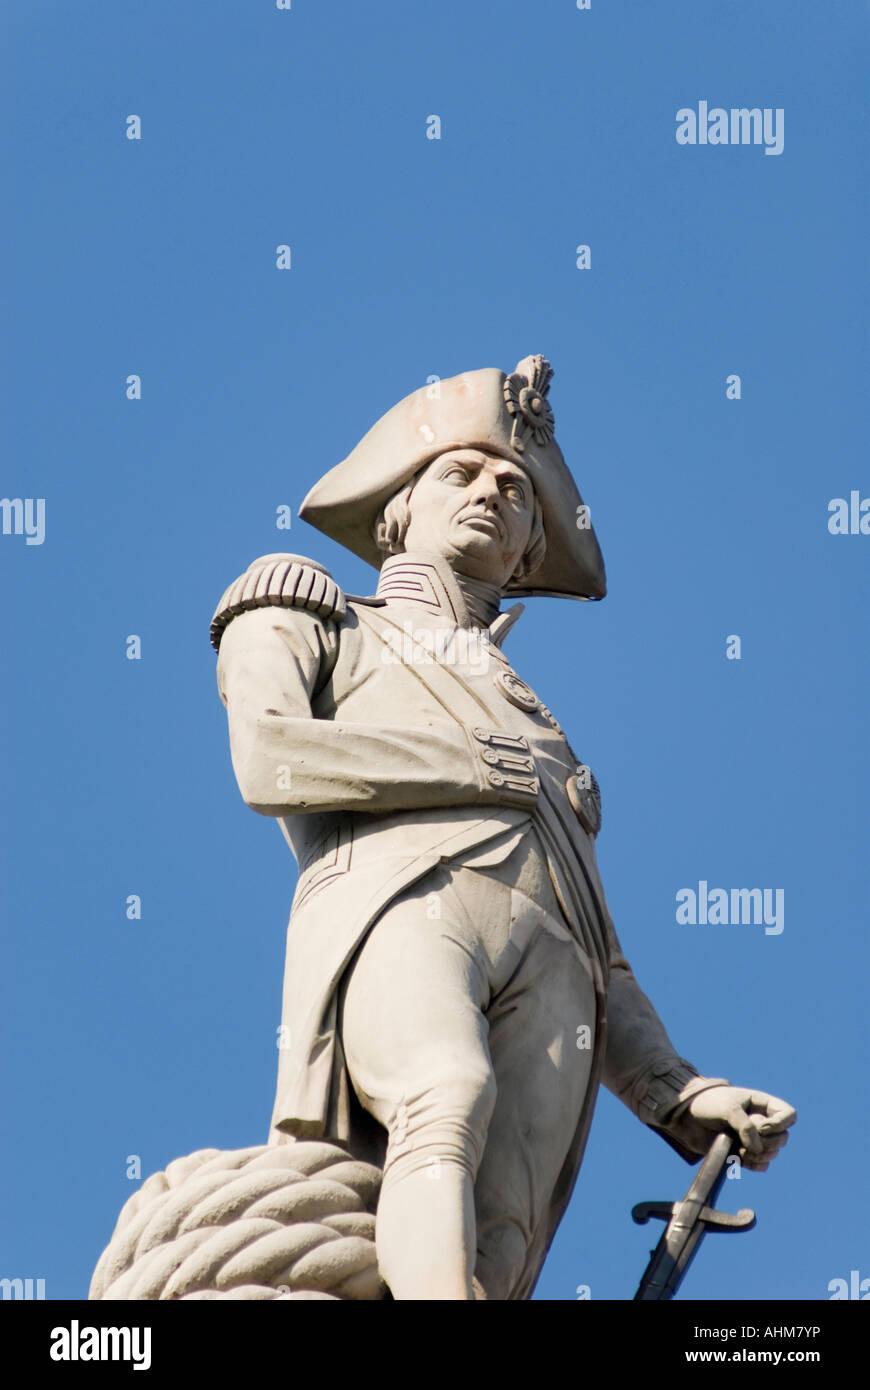 Statue of Nelson on top of Nelson's Column in Trafalgar Square London UK - Stock Image